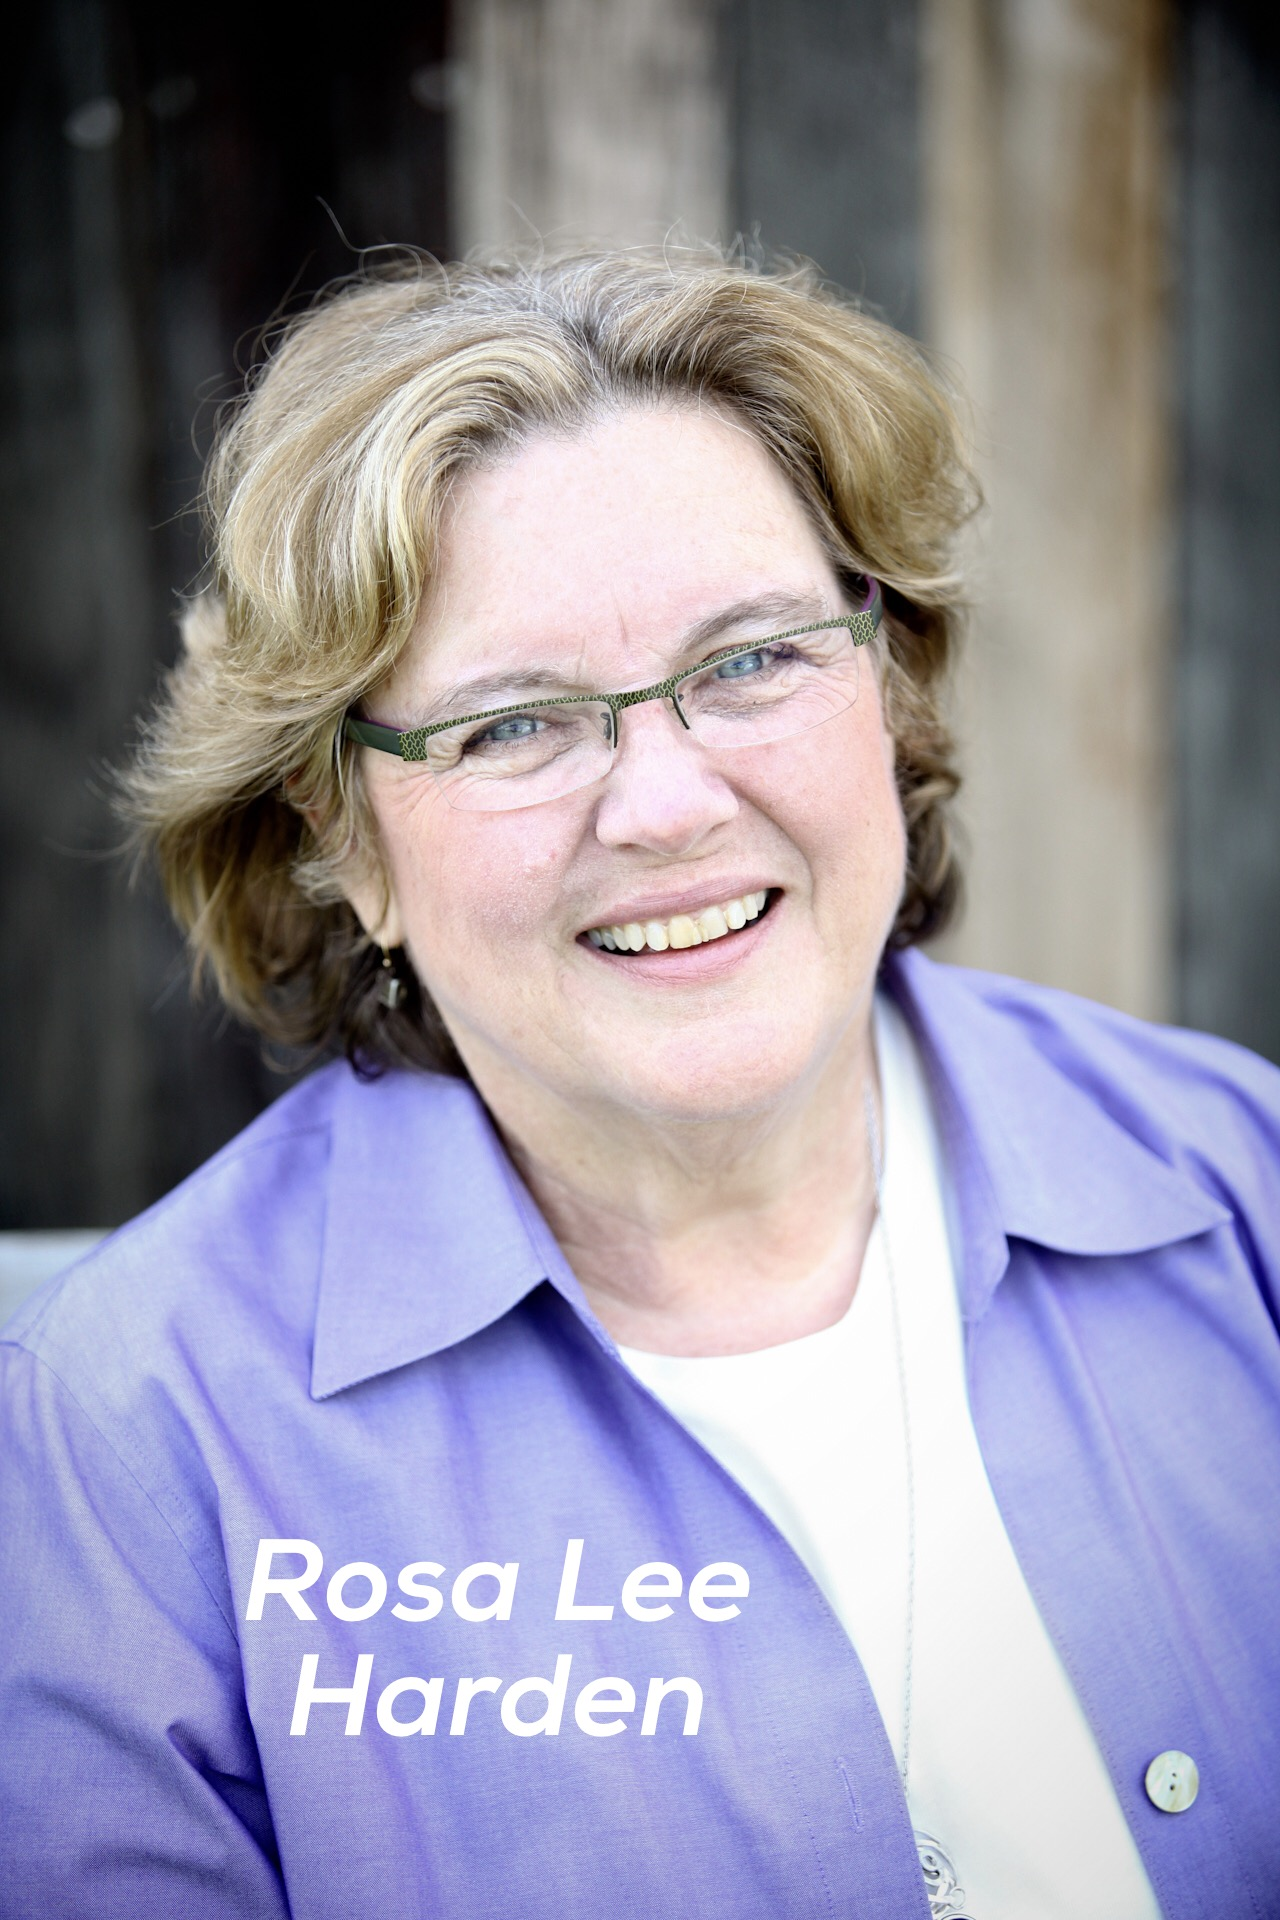 Rosa Lee Harden